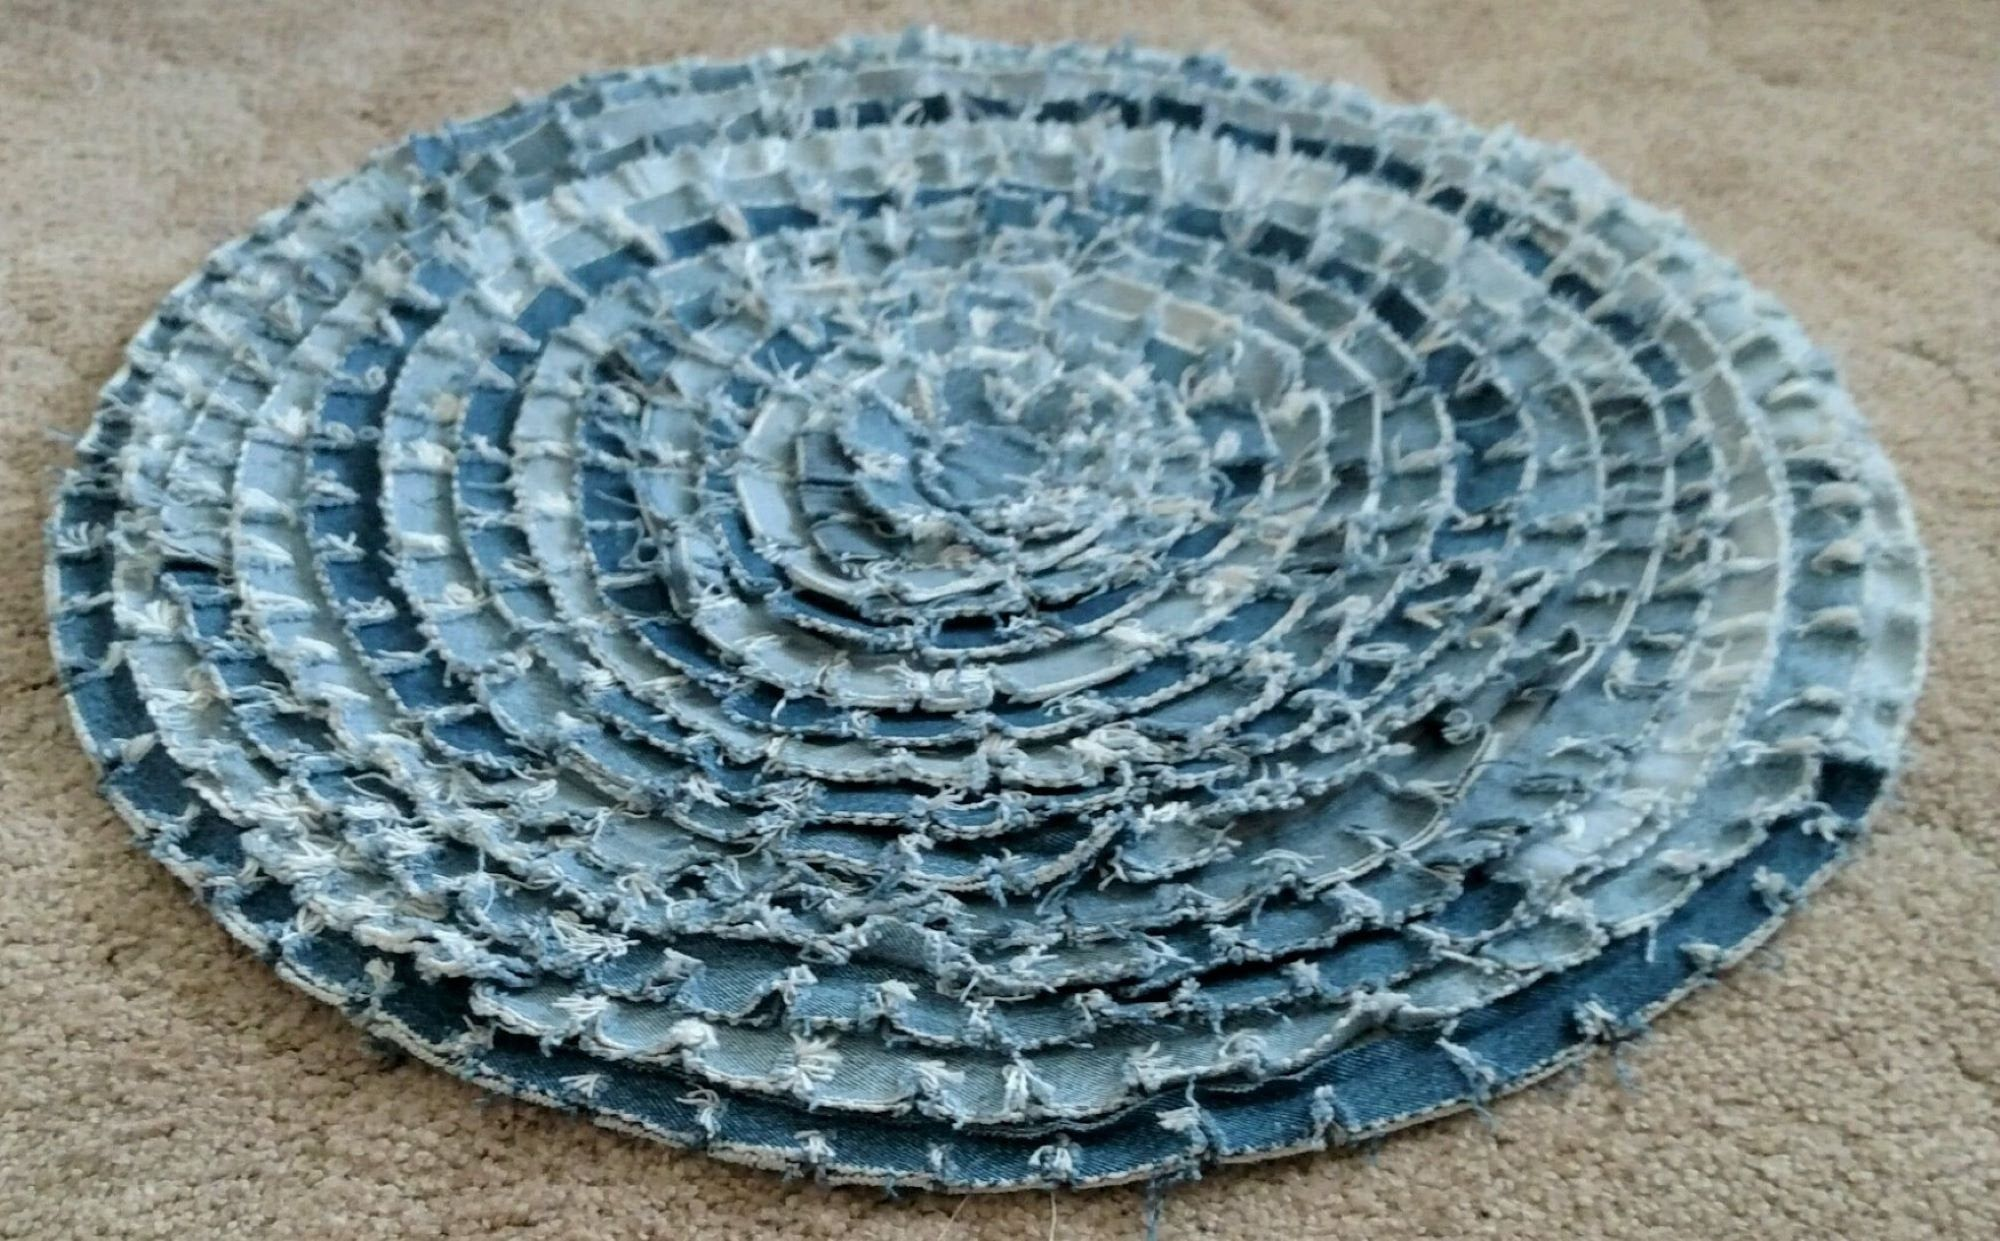 Round Denim Rug Recycled Denim Rug Upcycled Denim Rug In 2020 Denim Rug Washable Rugs Recycled Denim